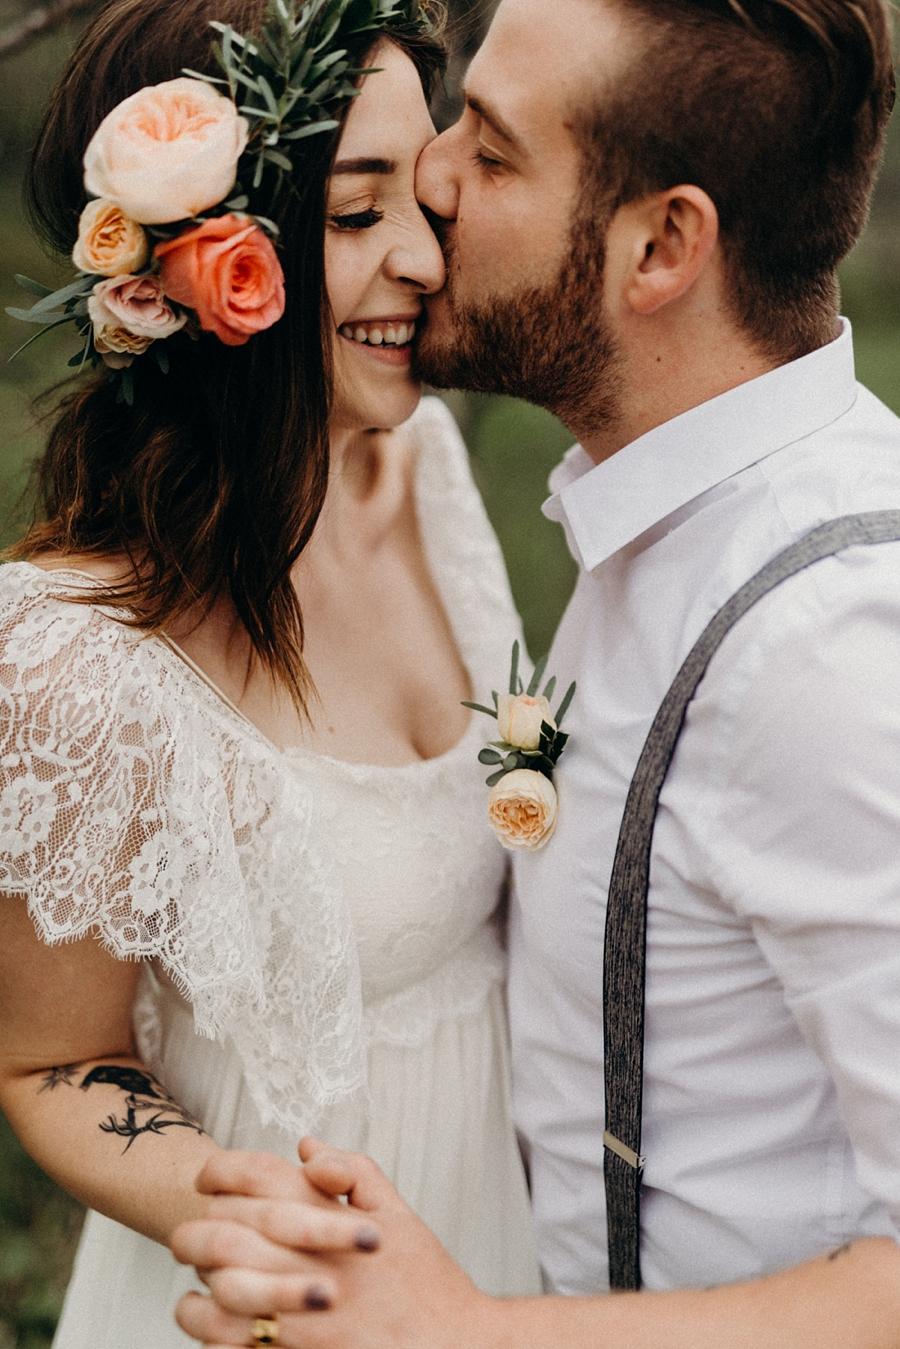 kaihla_tonai_intimate_wedding_elopement_photographer_7238.jpg